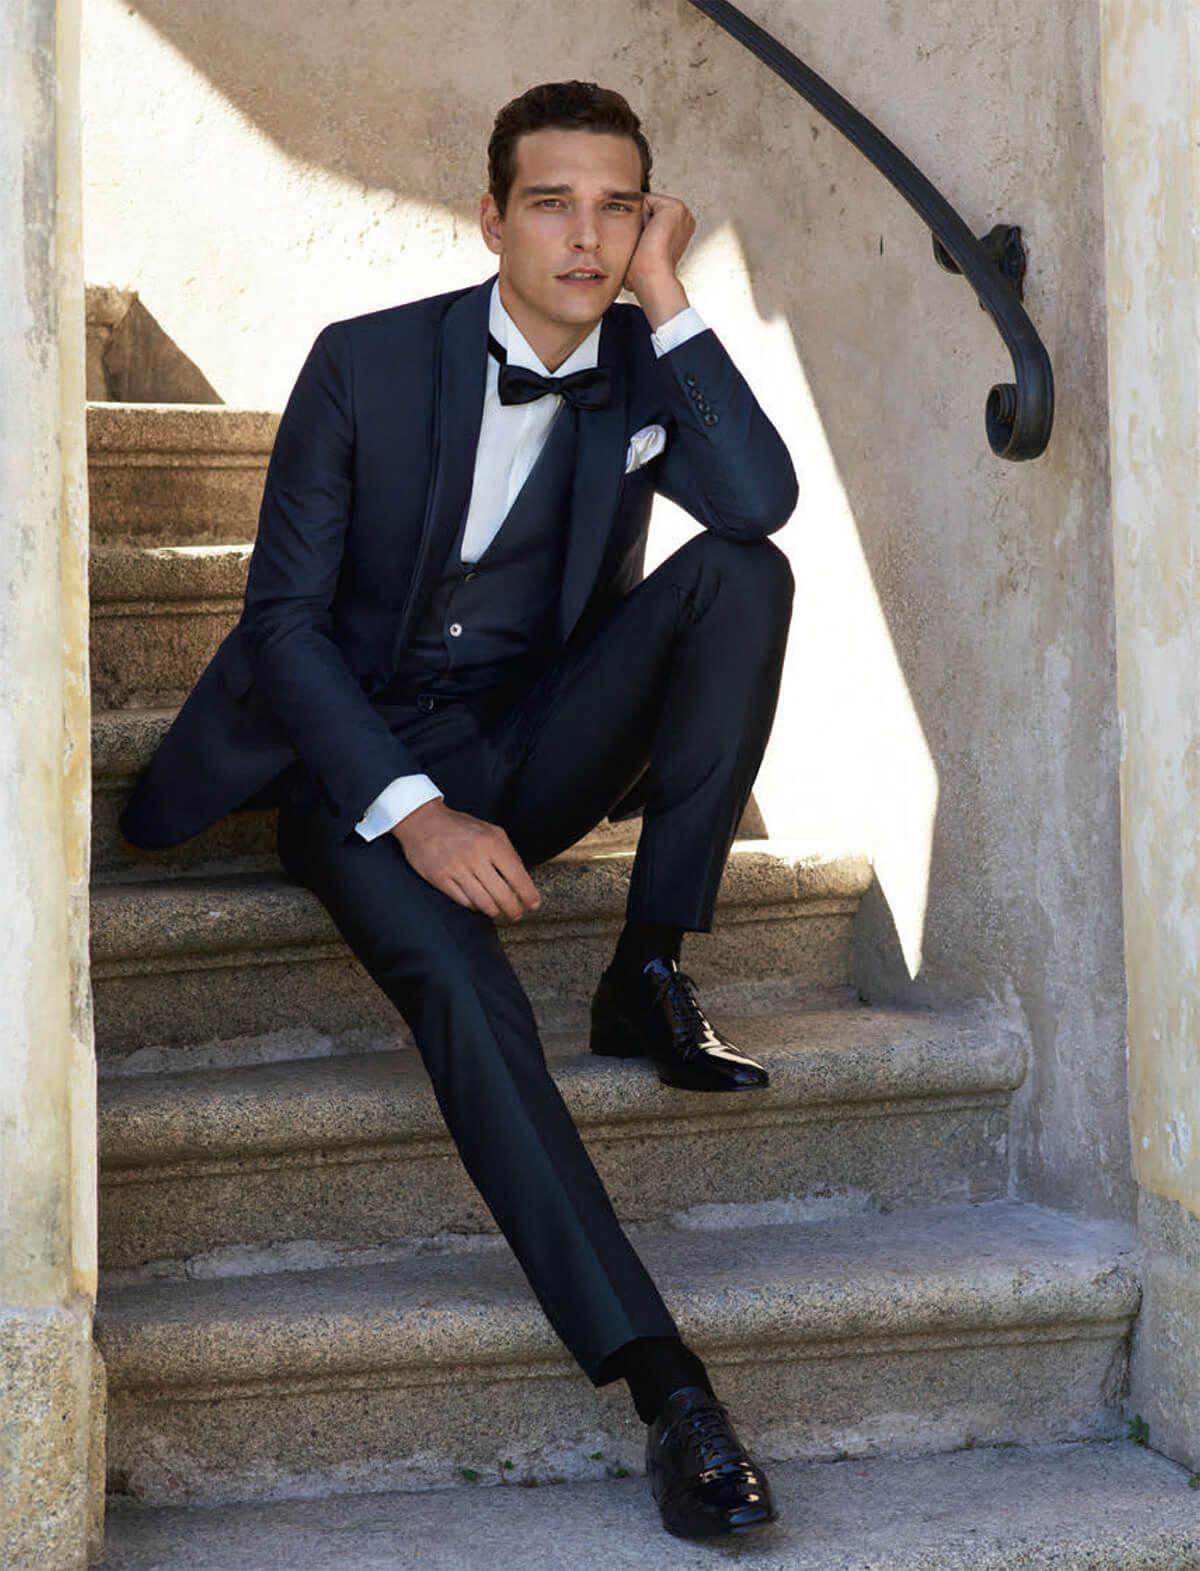 Matrimonio Look Uomo : Abiti da cerimonia uomo tendenze moda